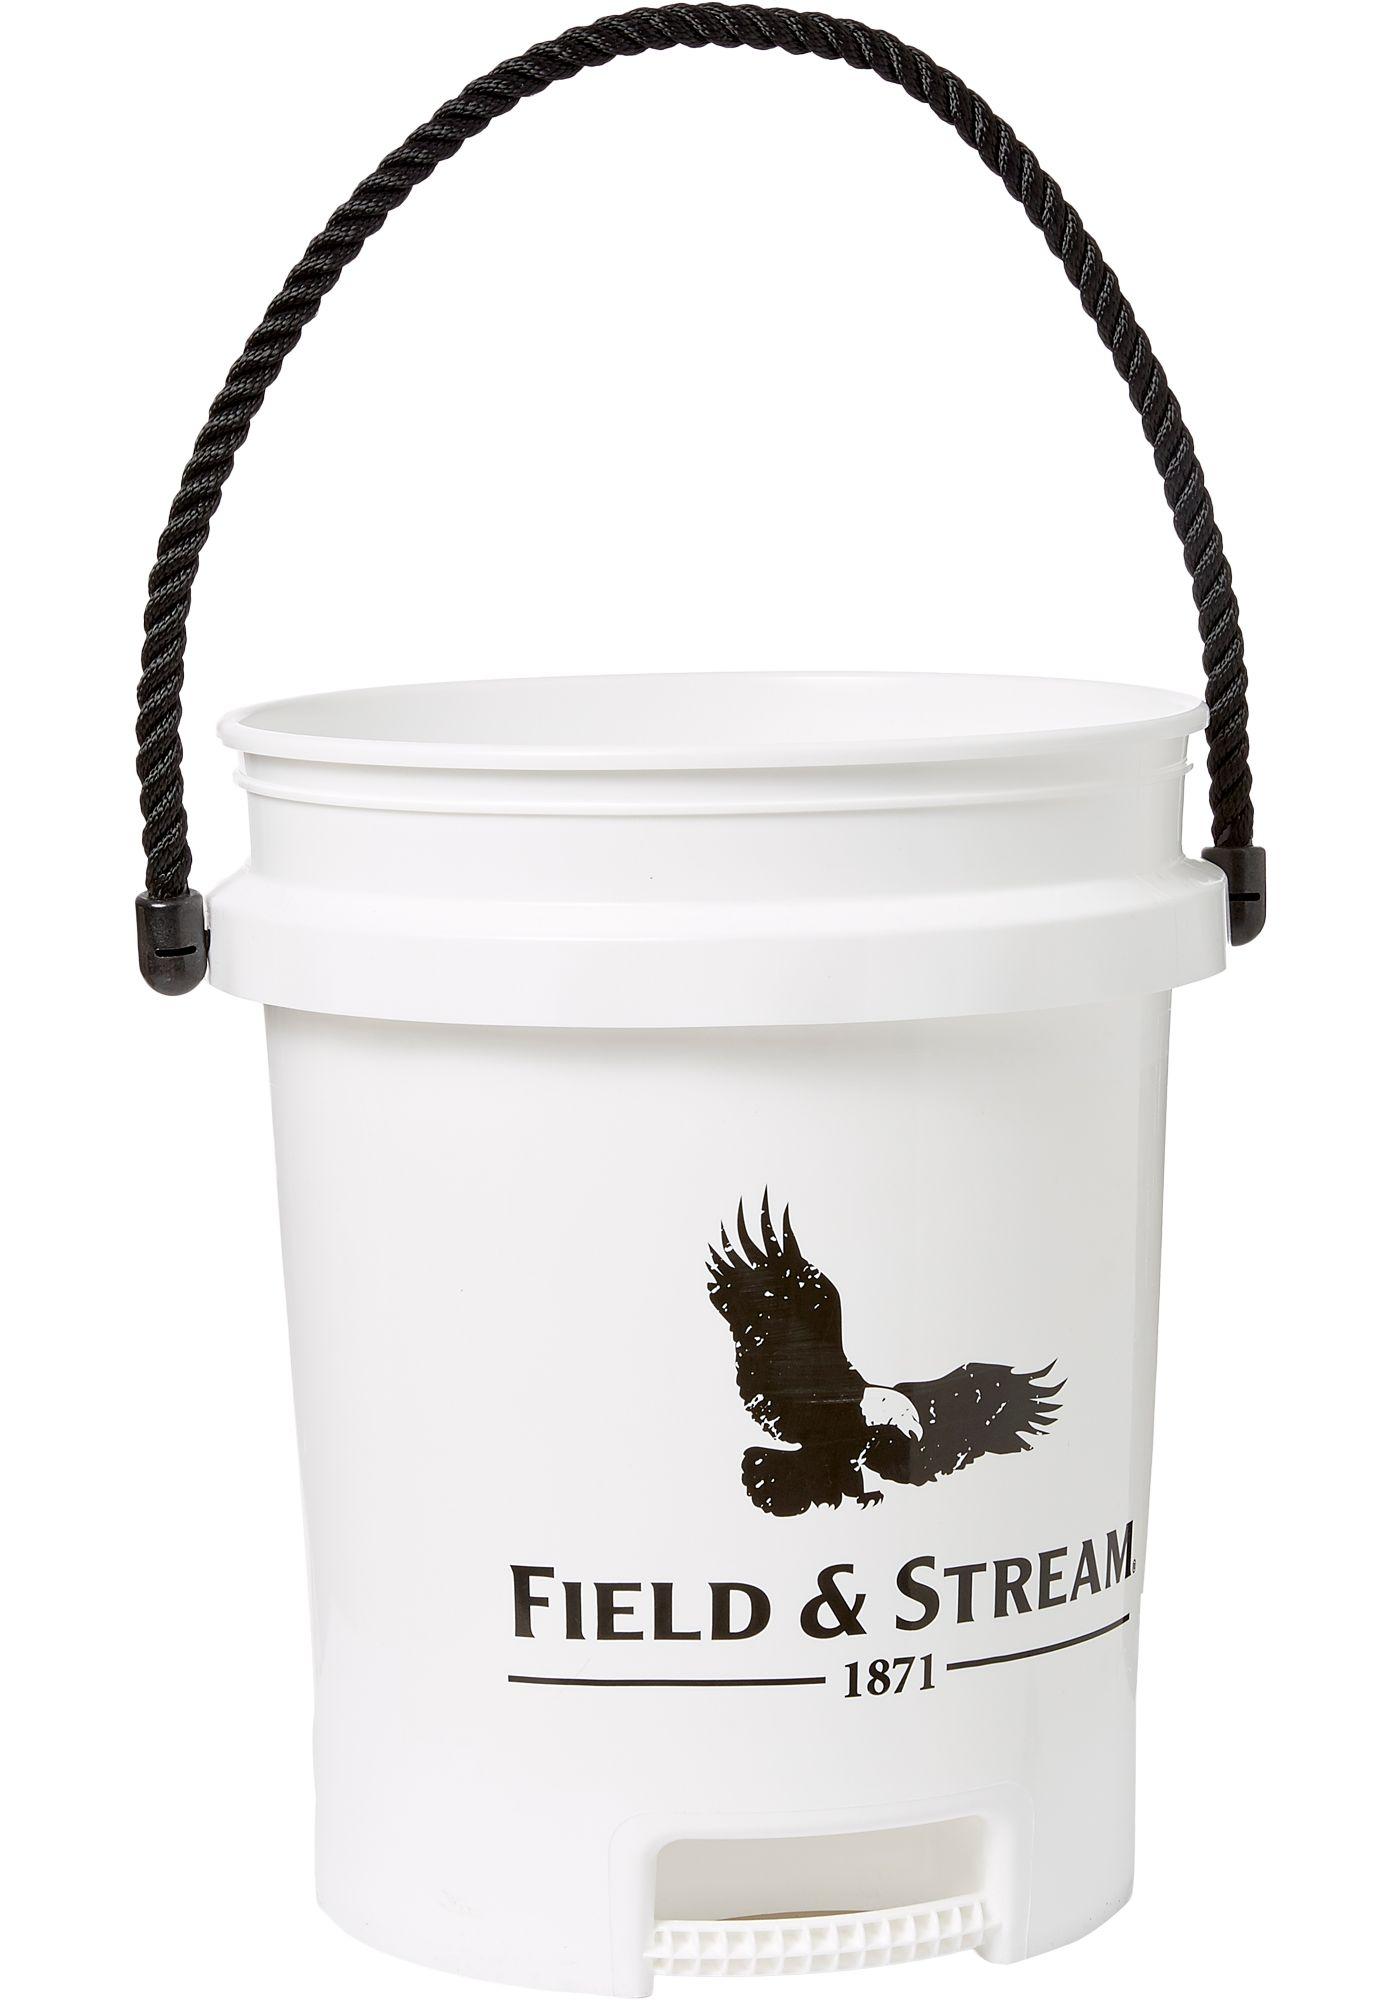 Field & Stream Rope Bucket